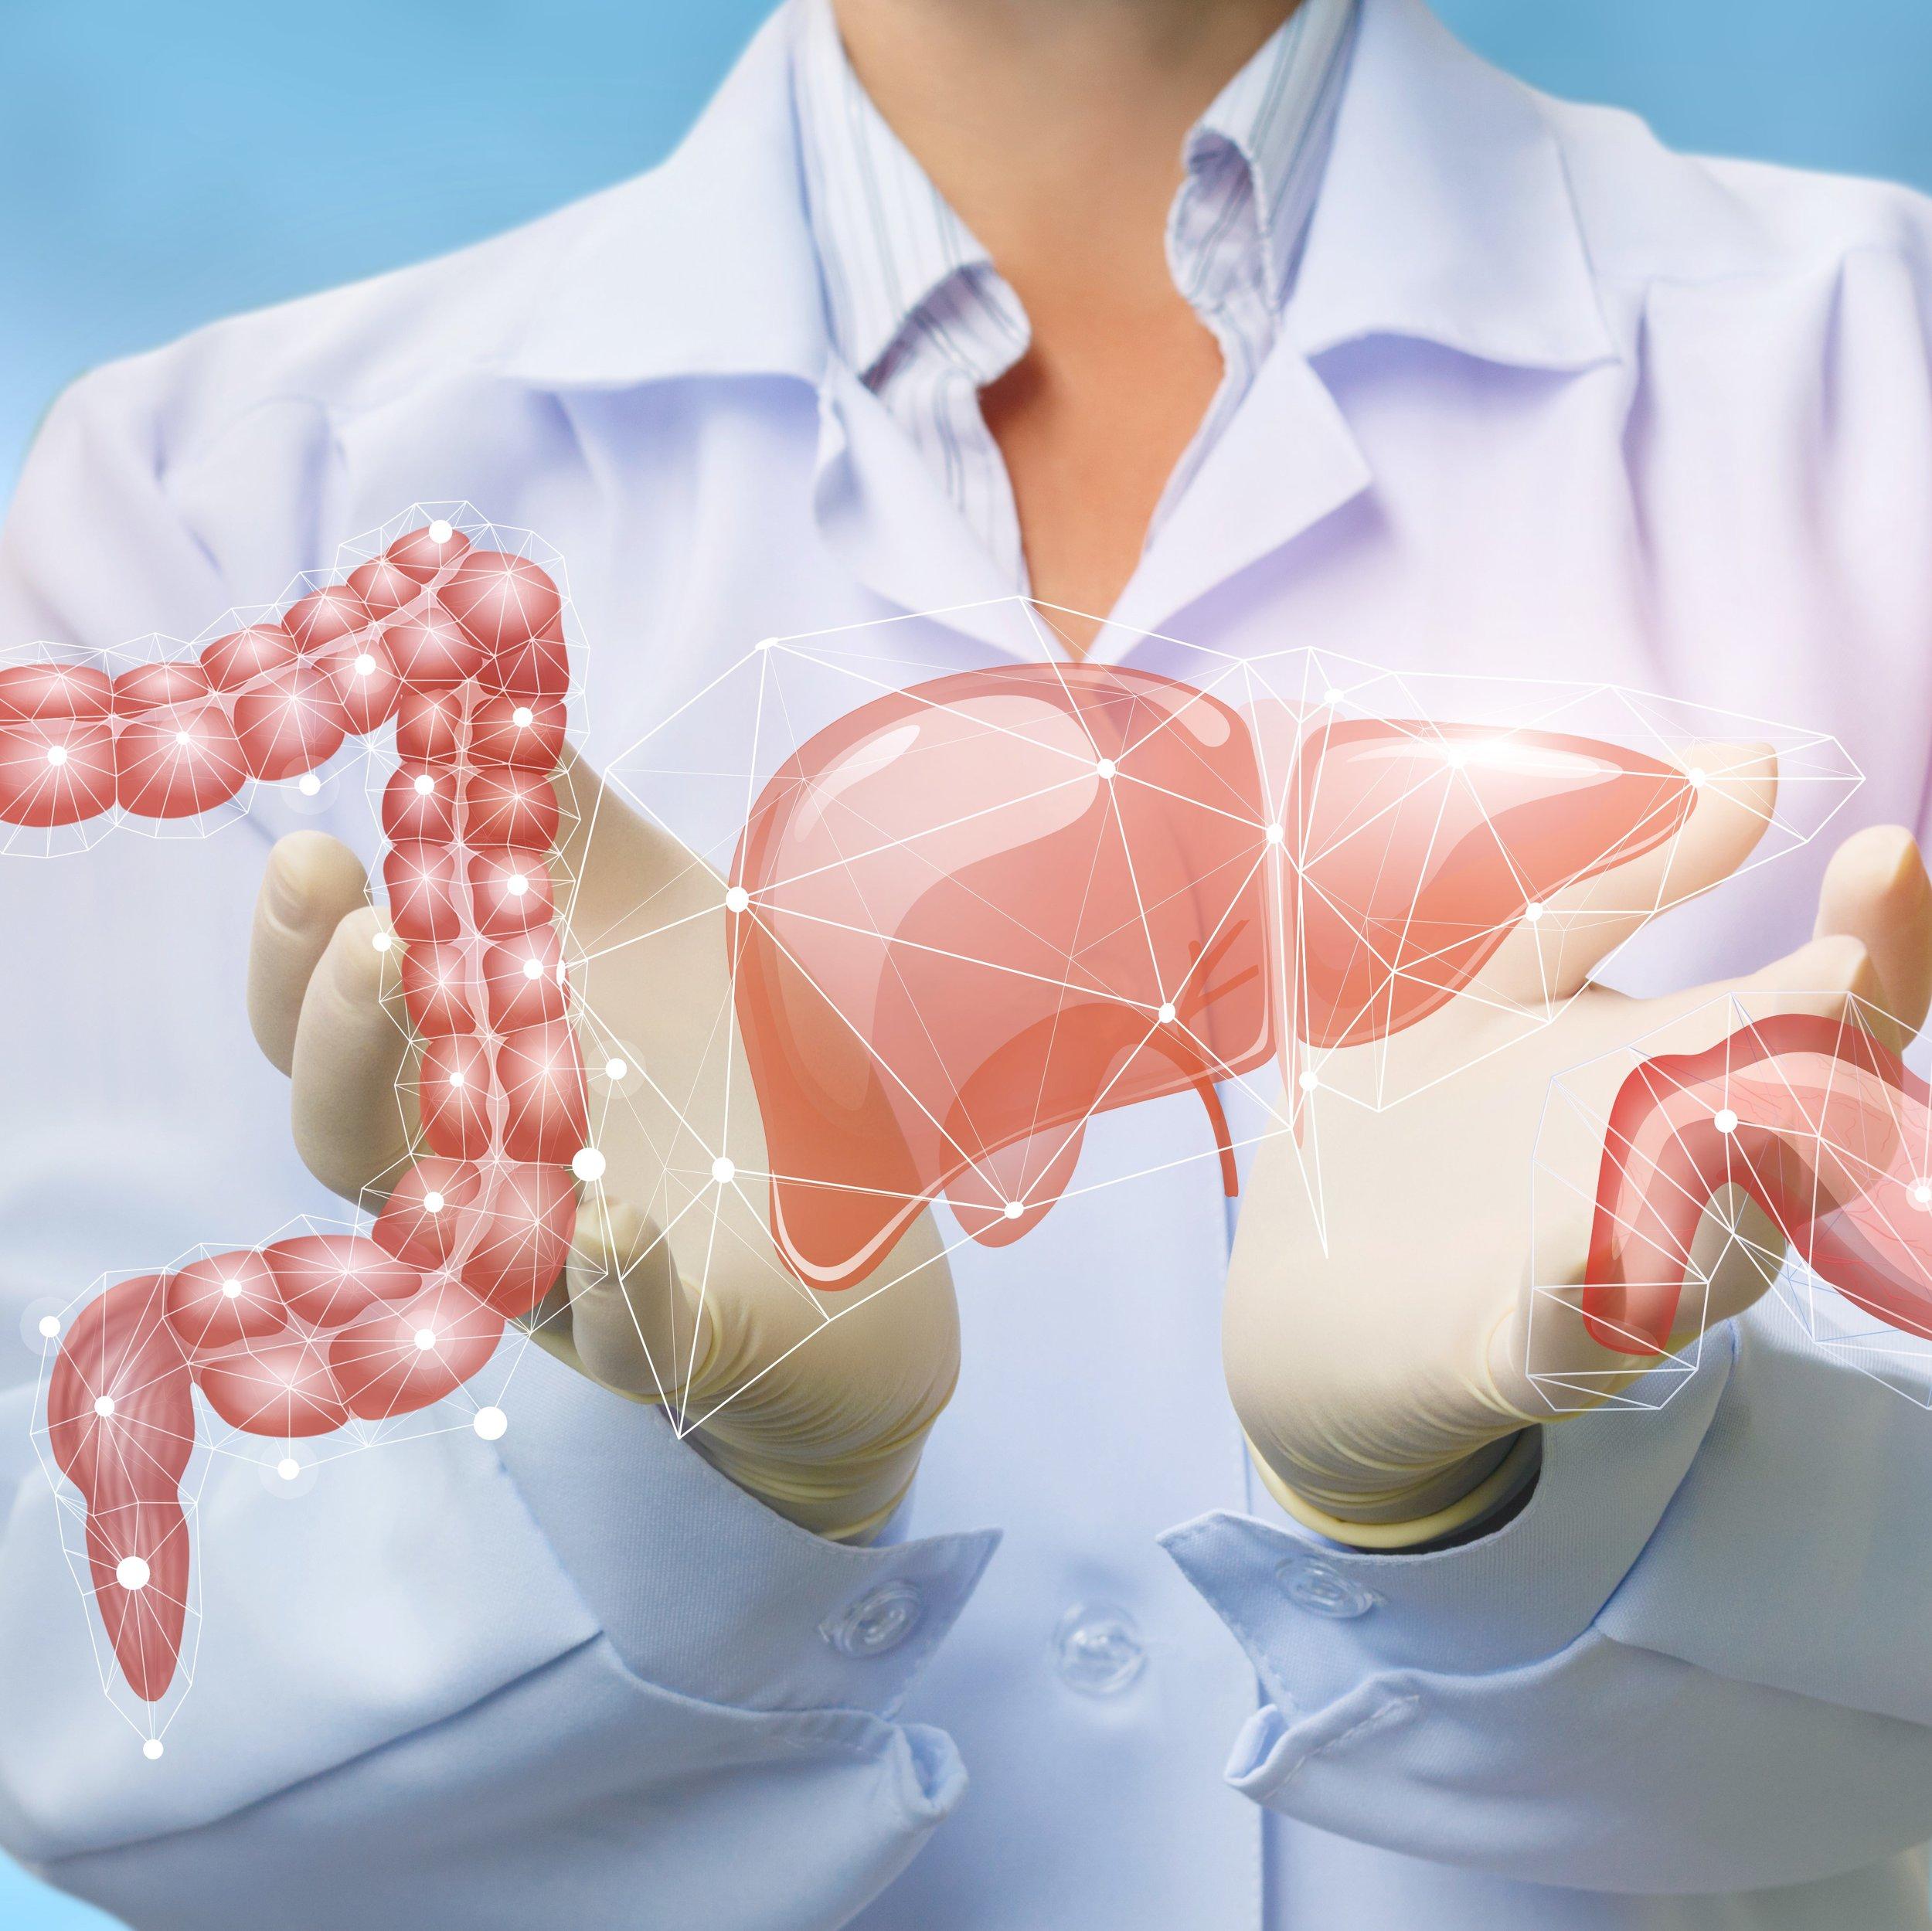 Gastroenterologia - ert rt ewt wet